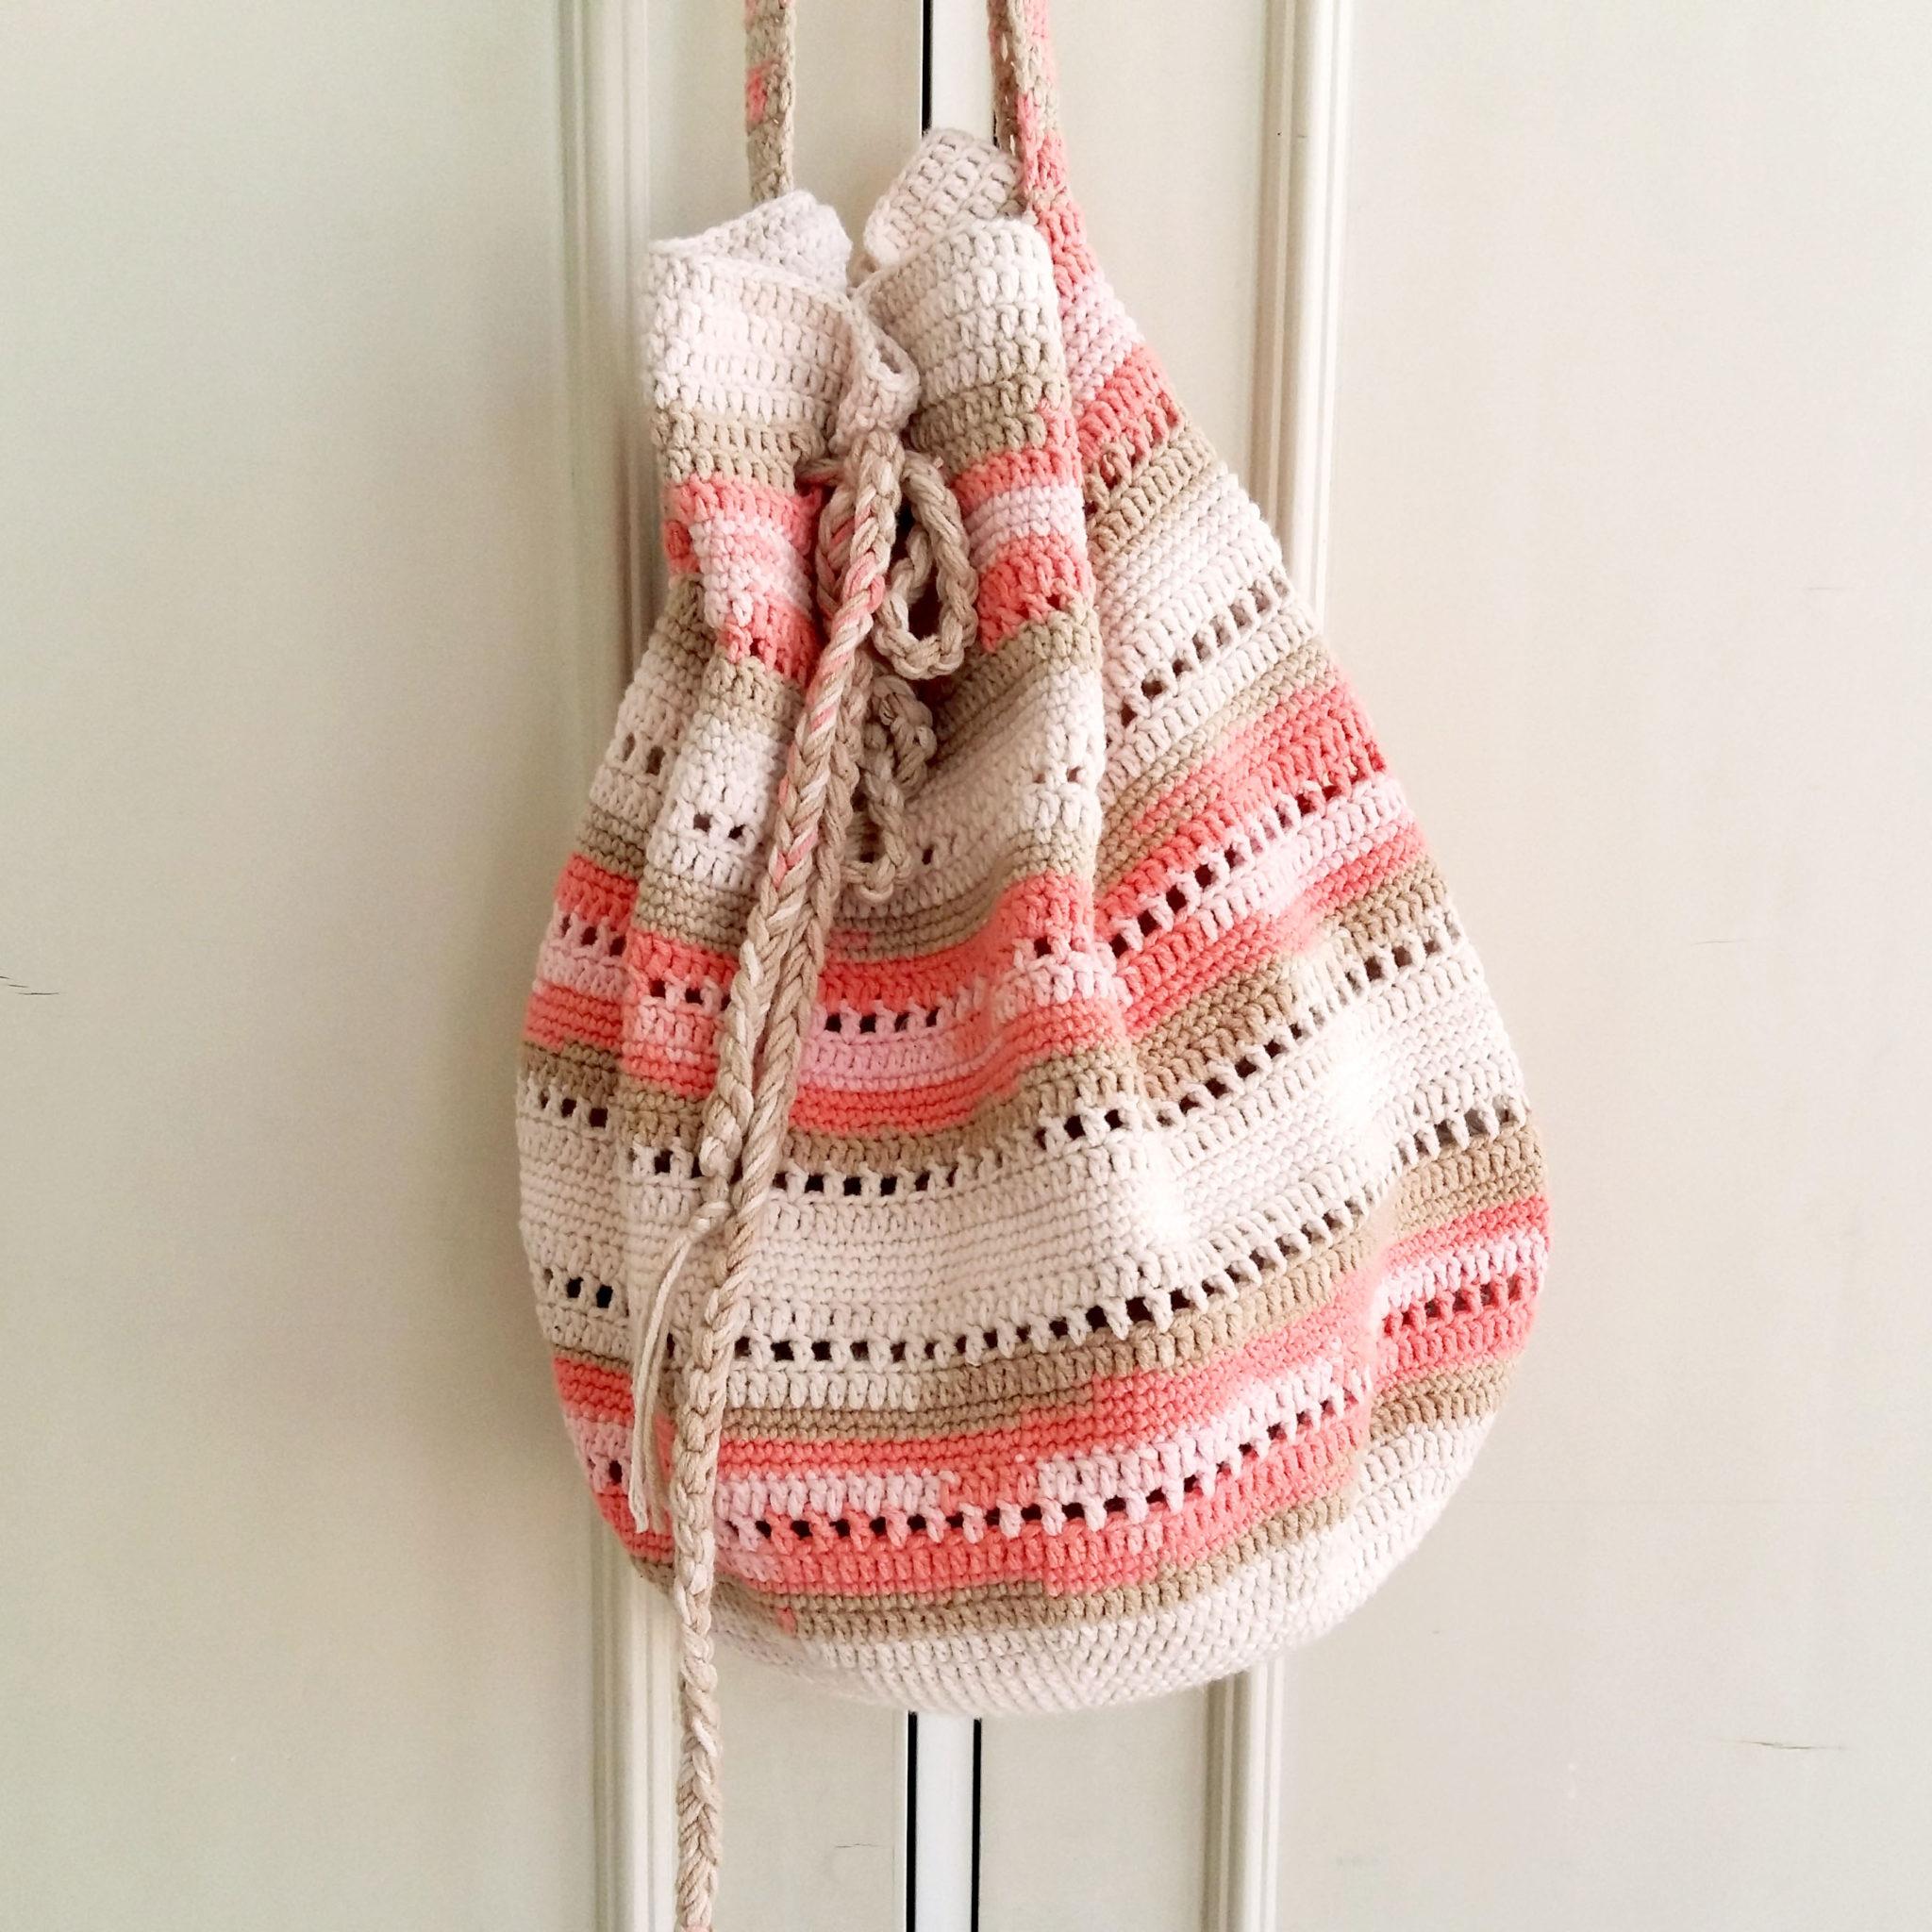 Seaside Handbag Free Crochet Pattern My Accessory Box